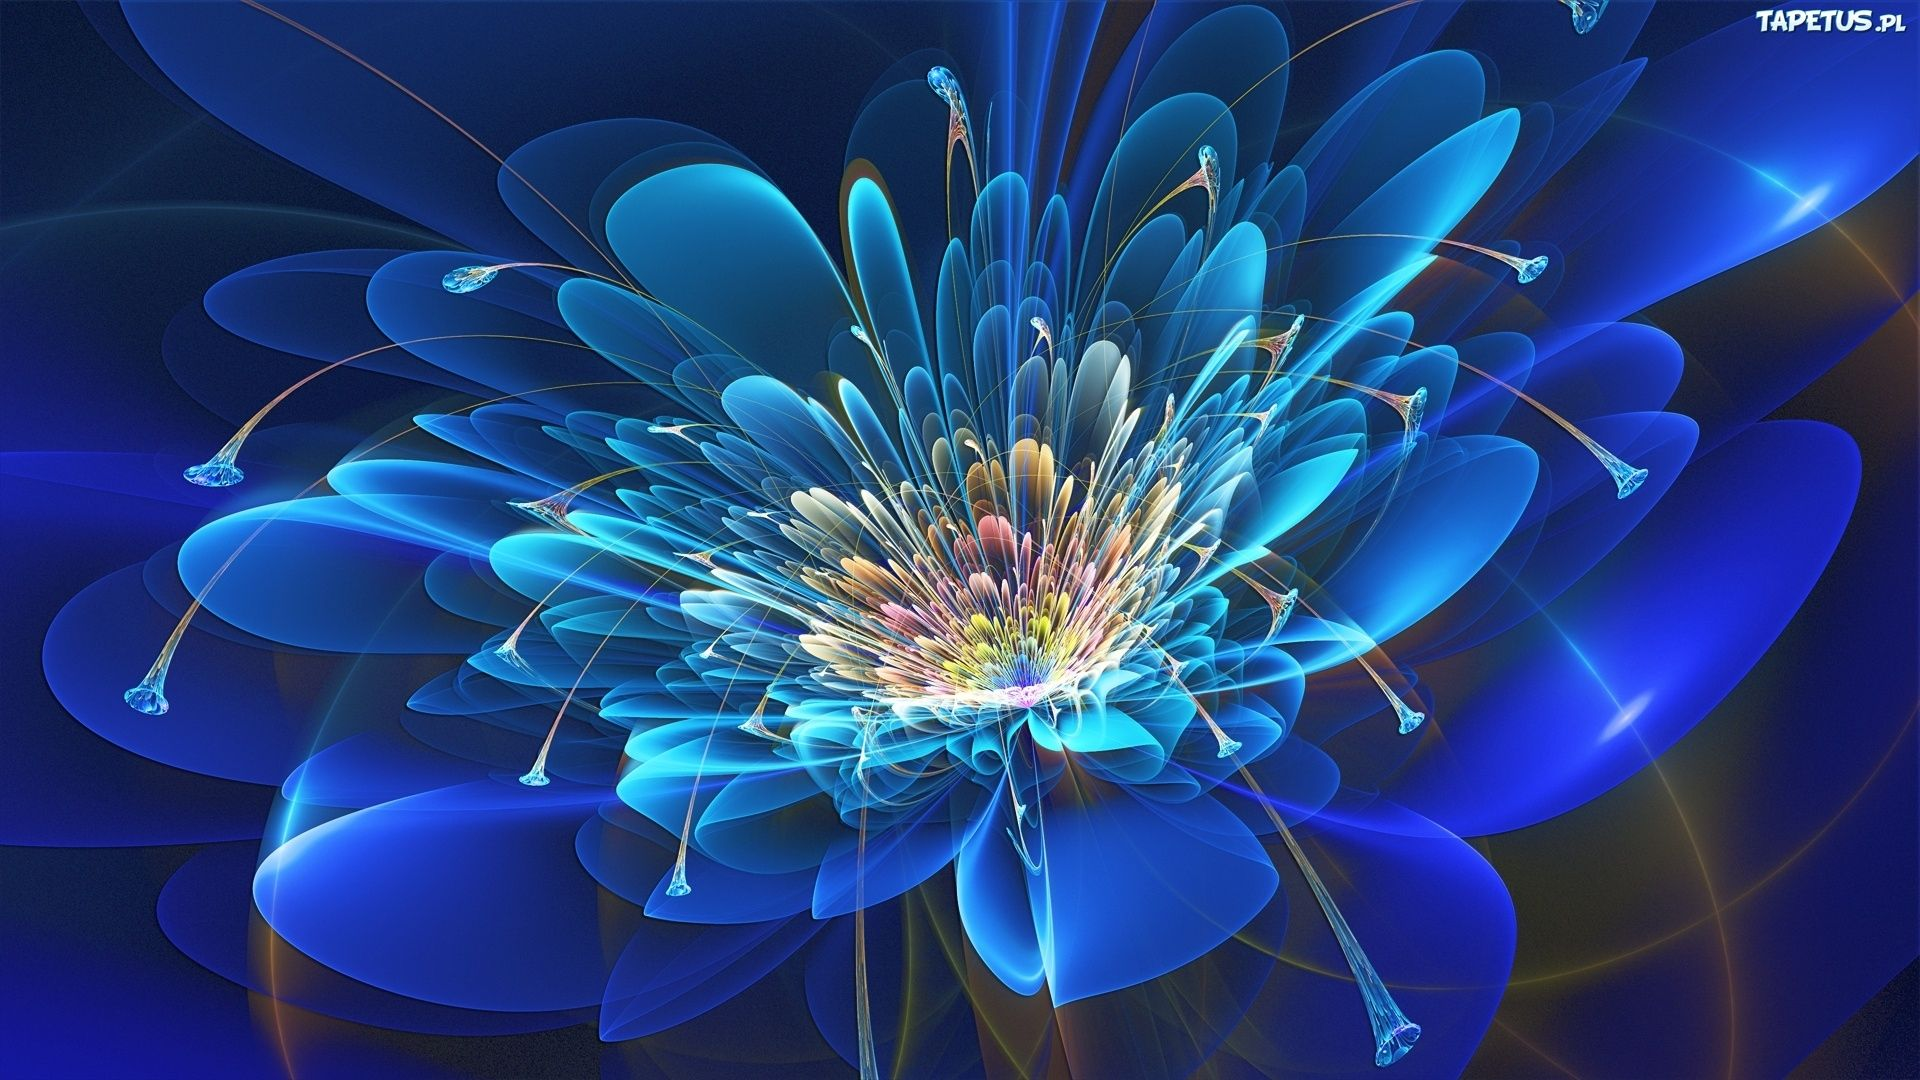 More Fabulous Flowers, Neon Flowers Live Wallpaper